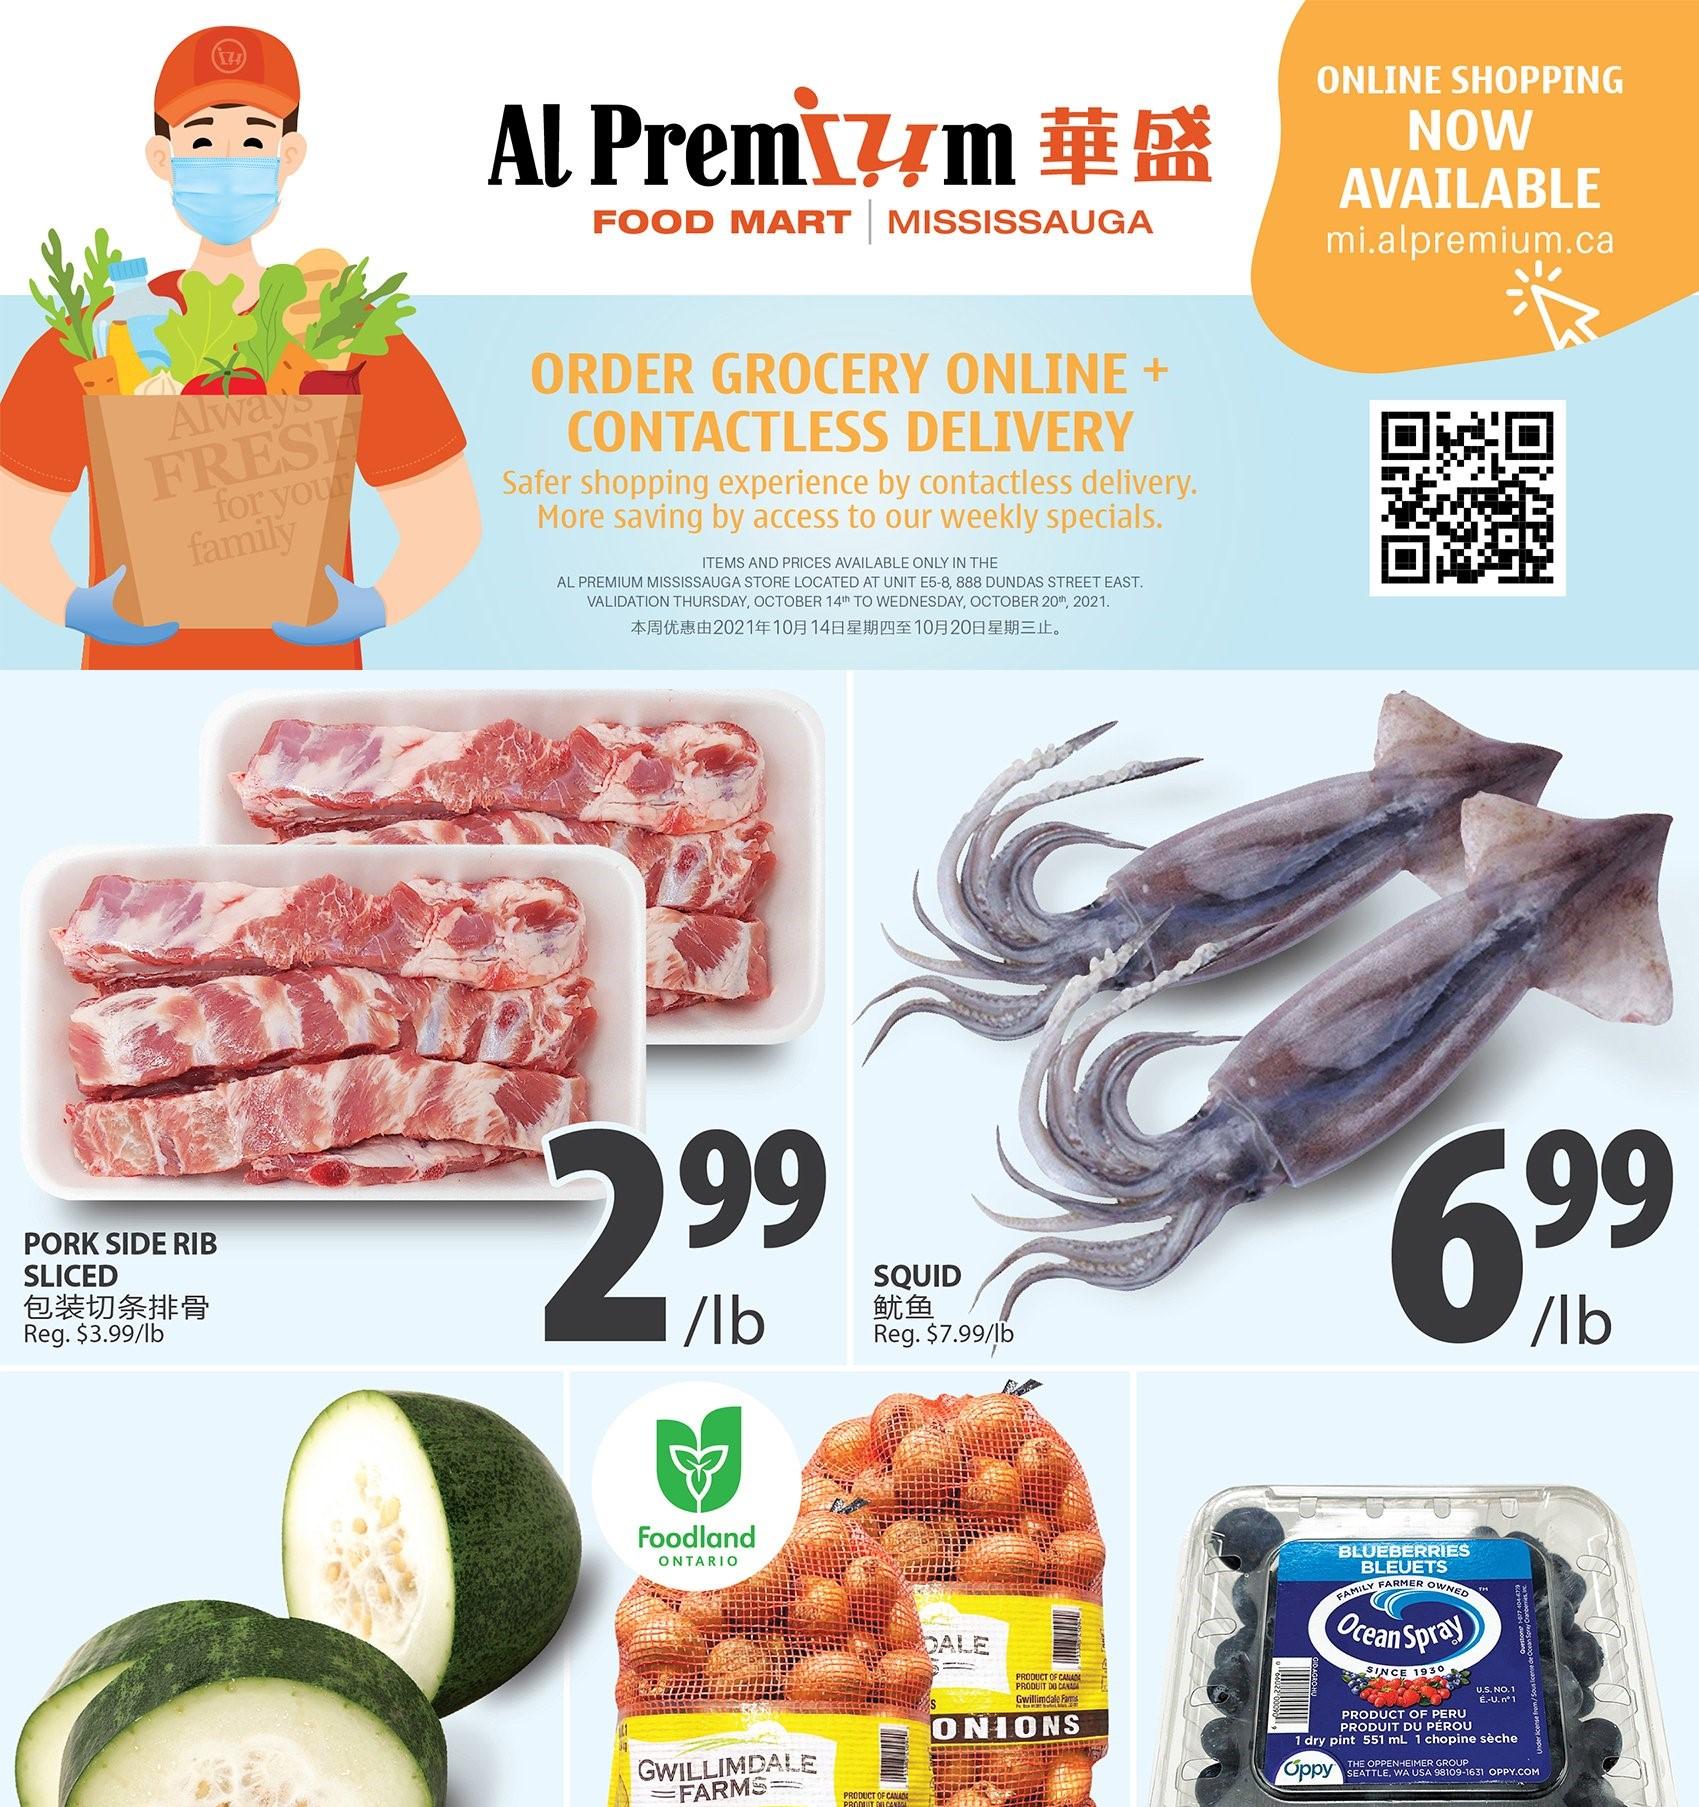 Al Premium Food Mart Mississauga Flyer   Oct 14